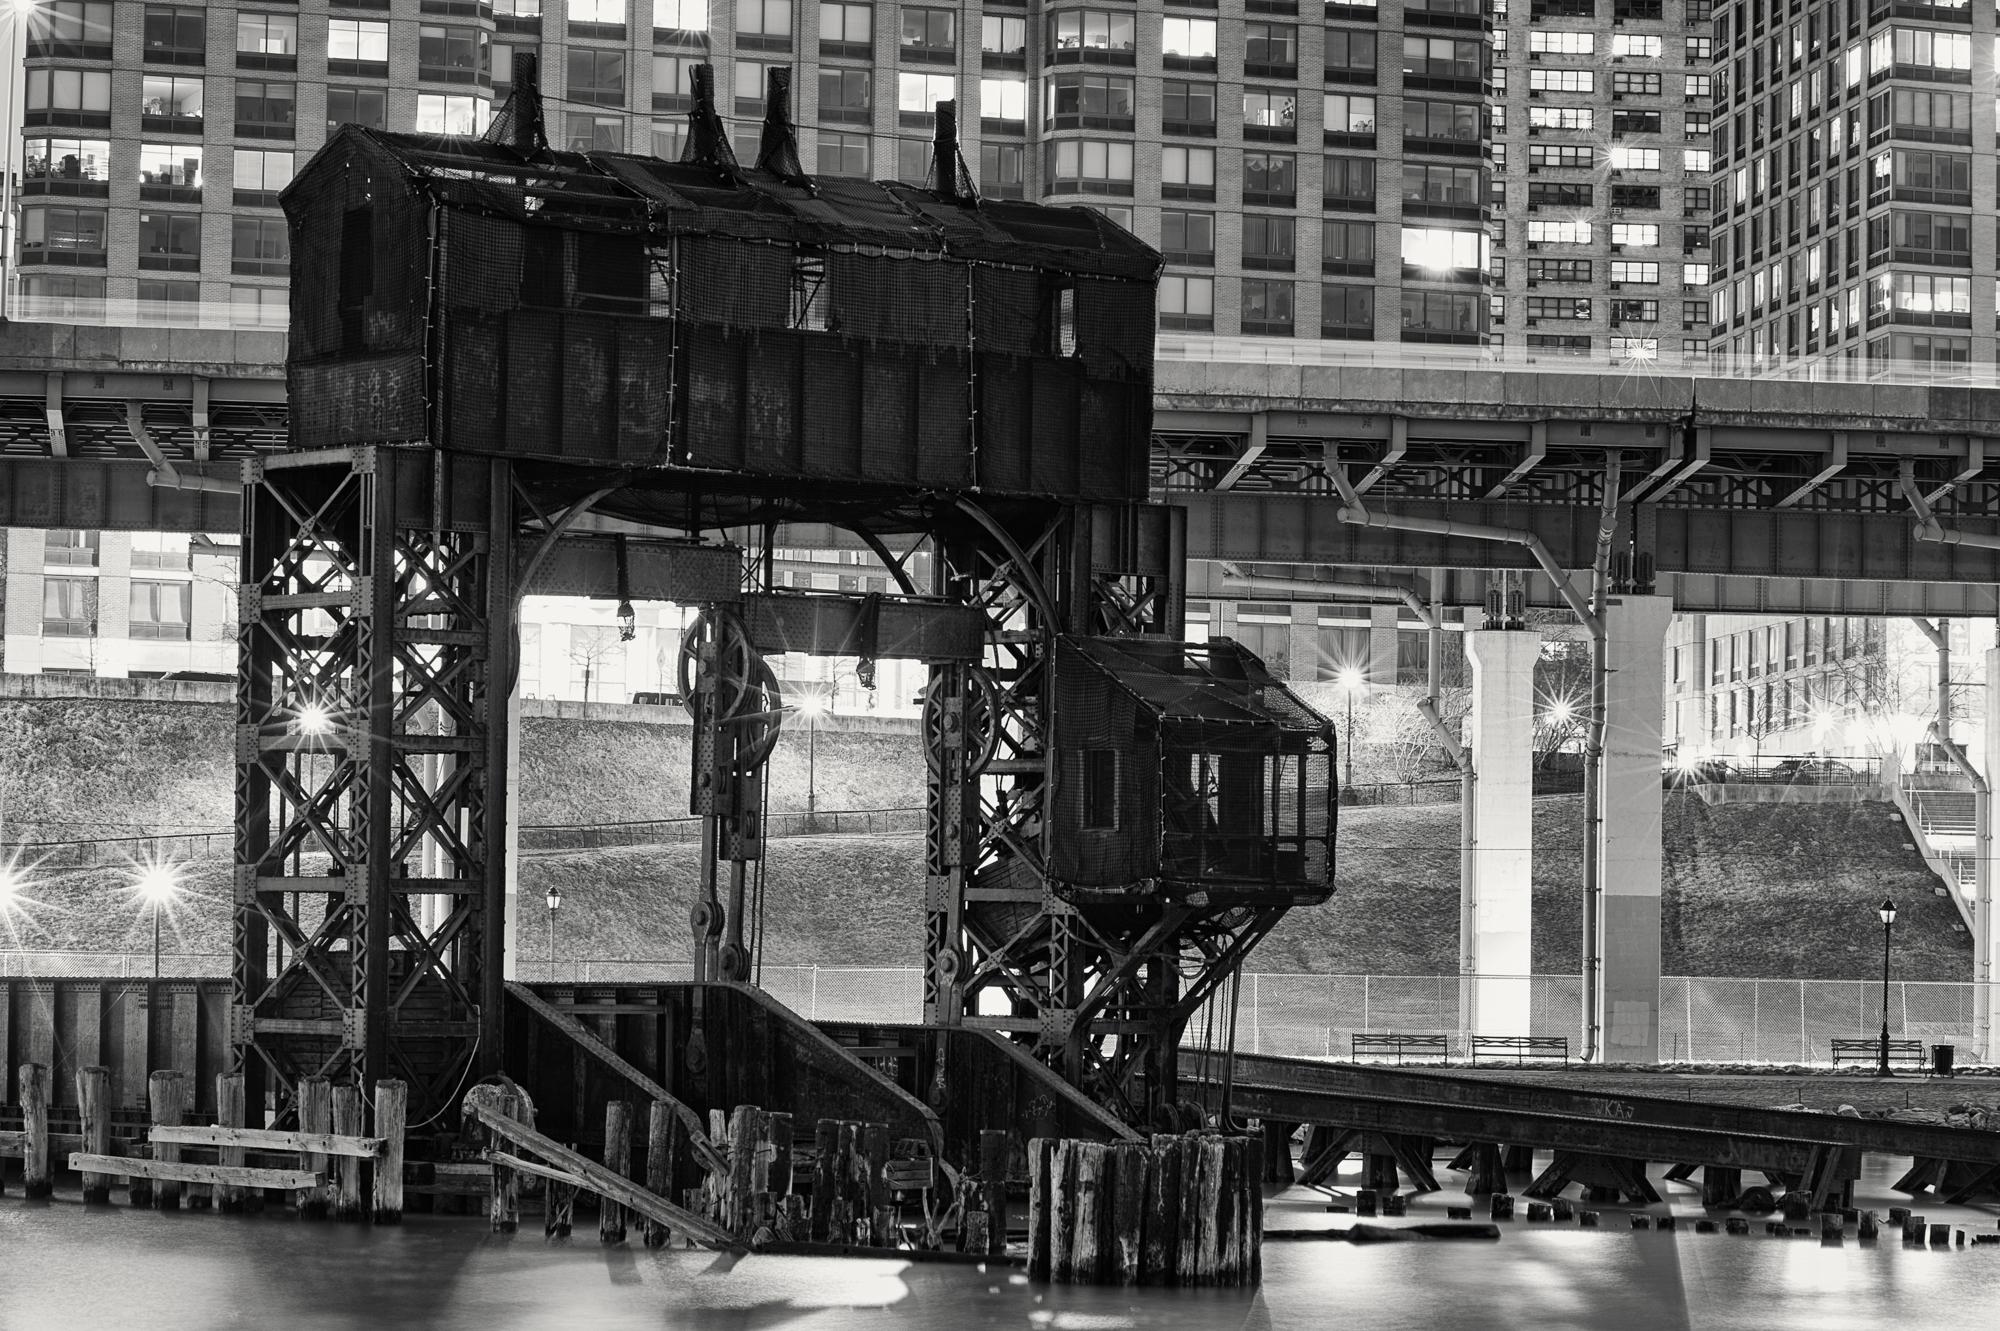 69th St Transfer Bridge, Manhattan